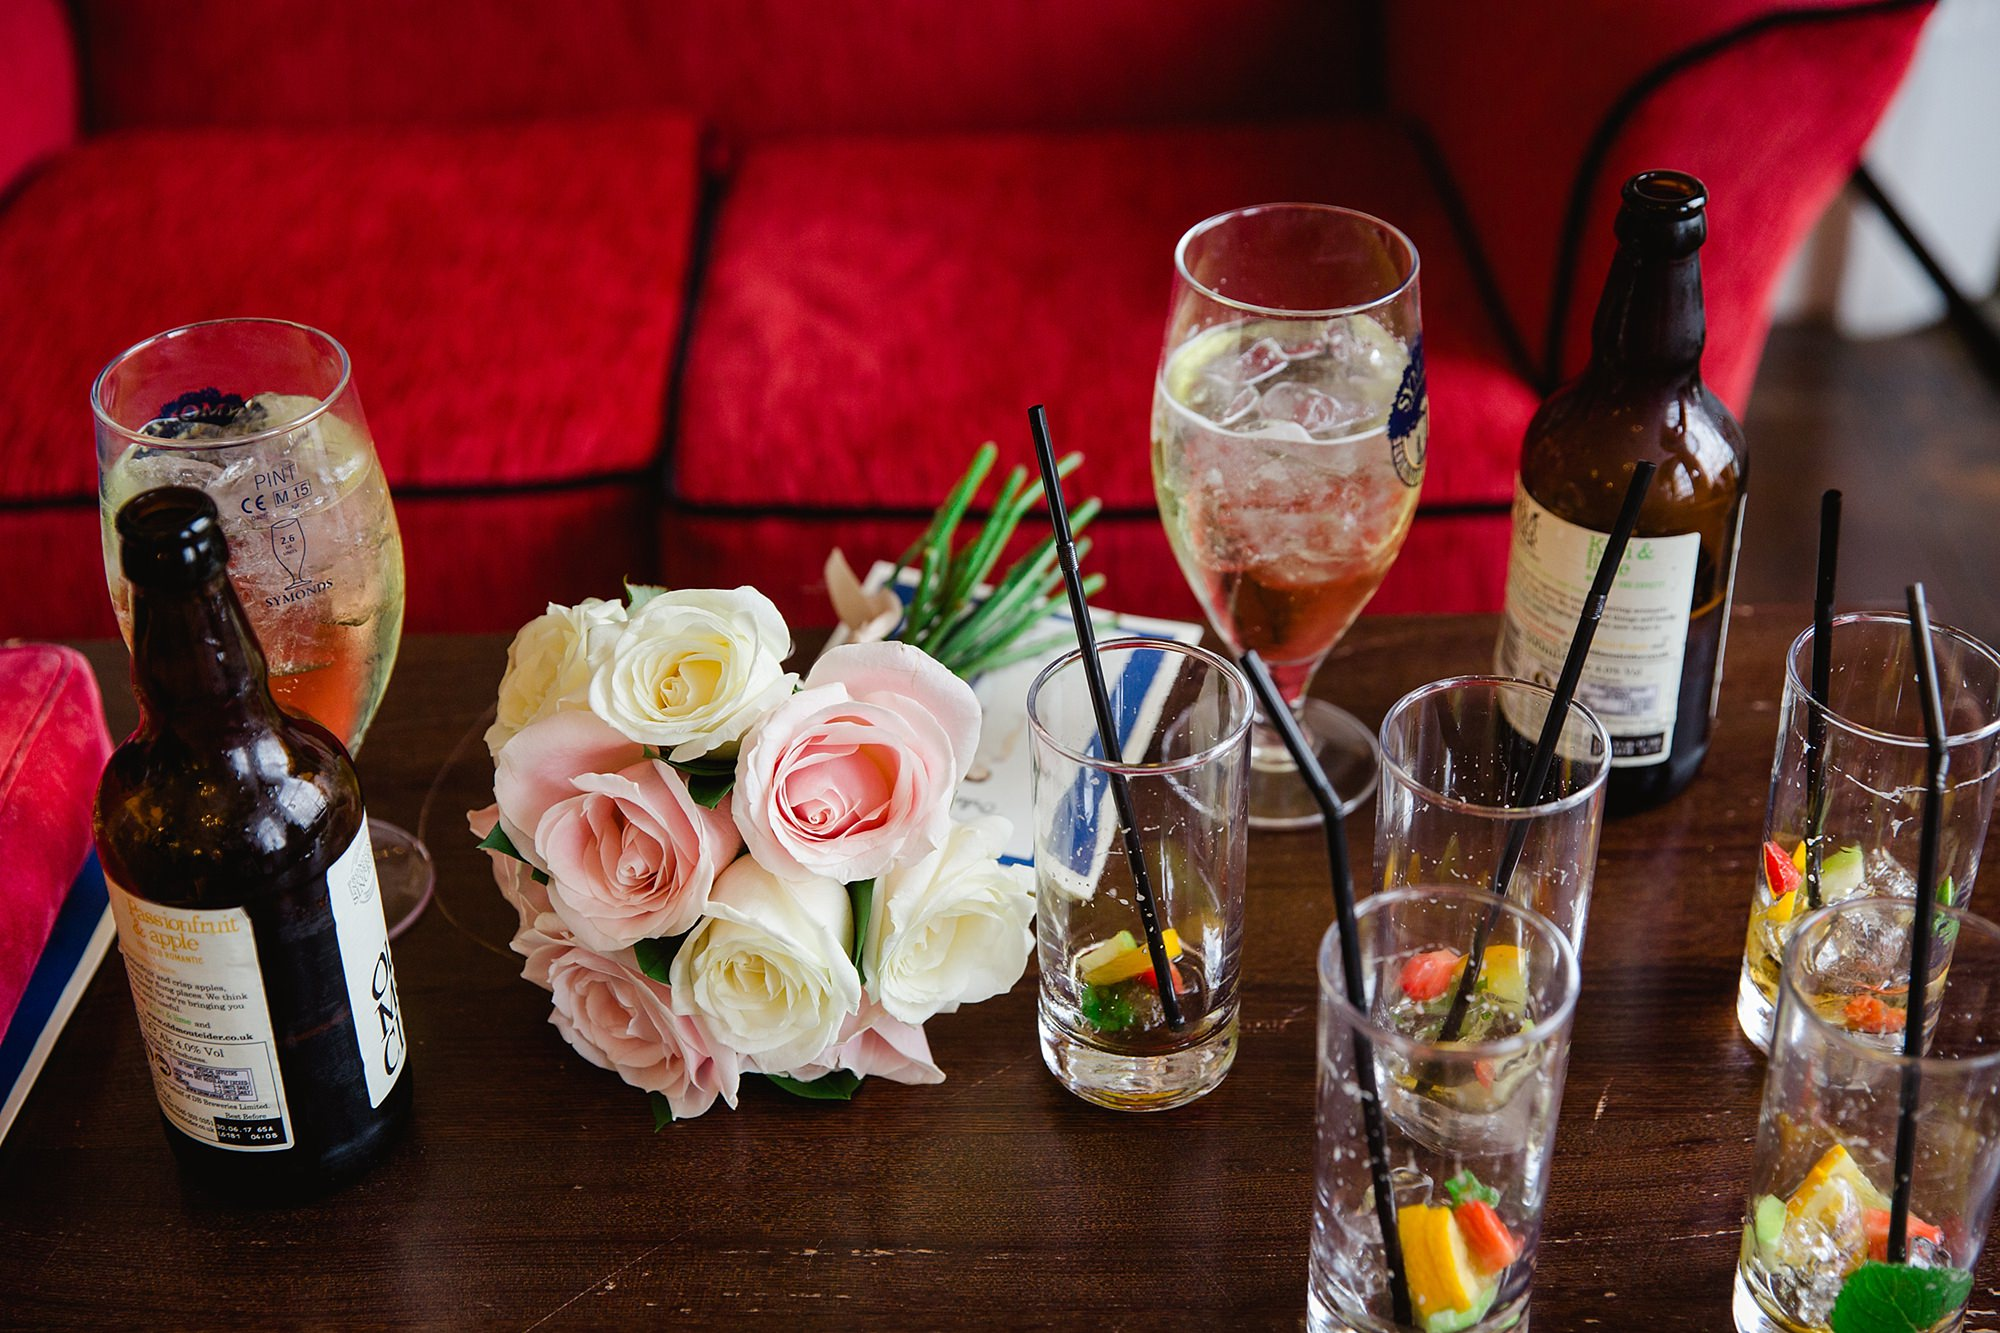 Trafalgar Tavern wedding bride's bouquet amongst Pimms